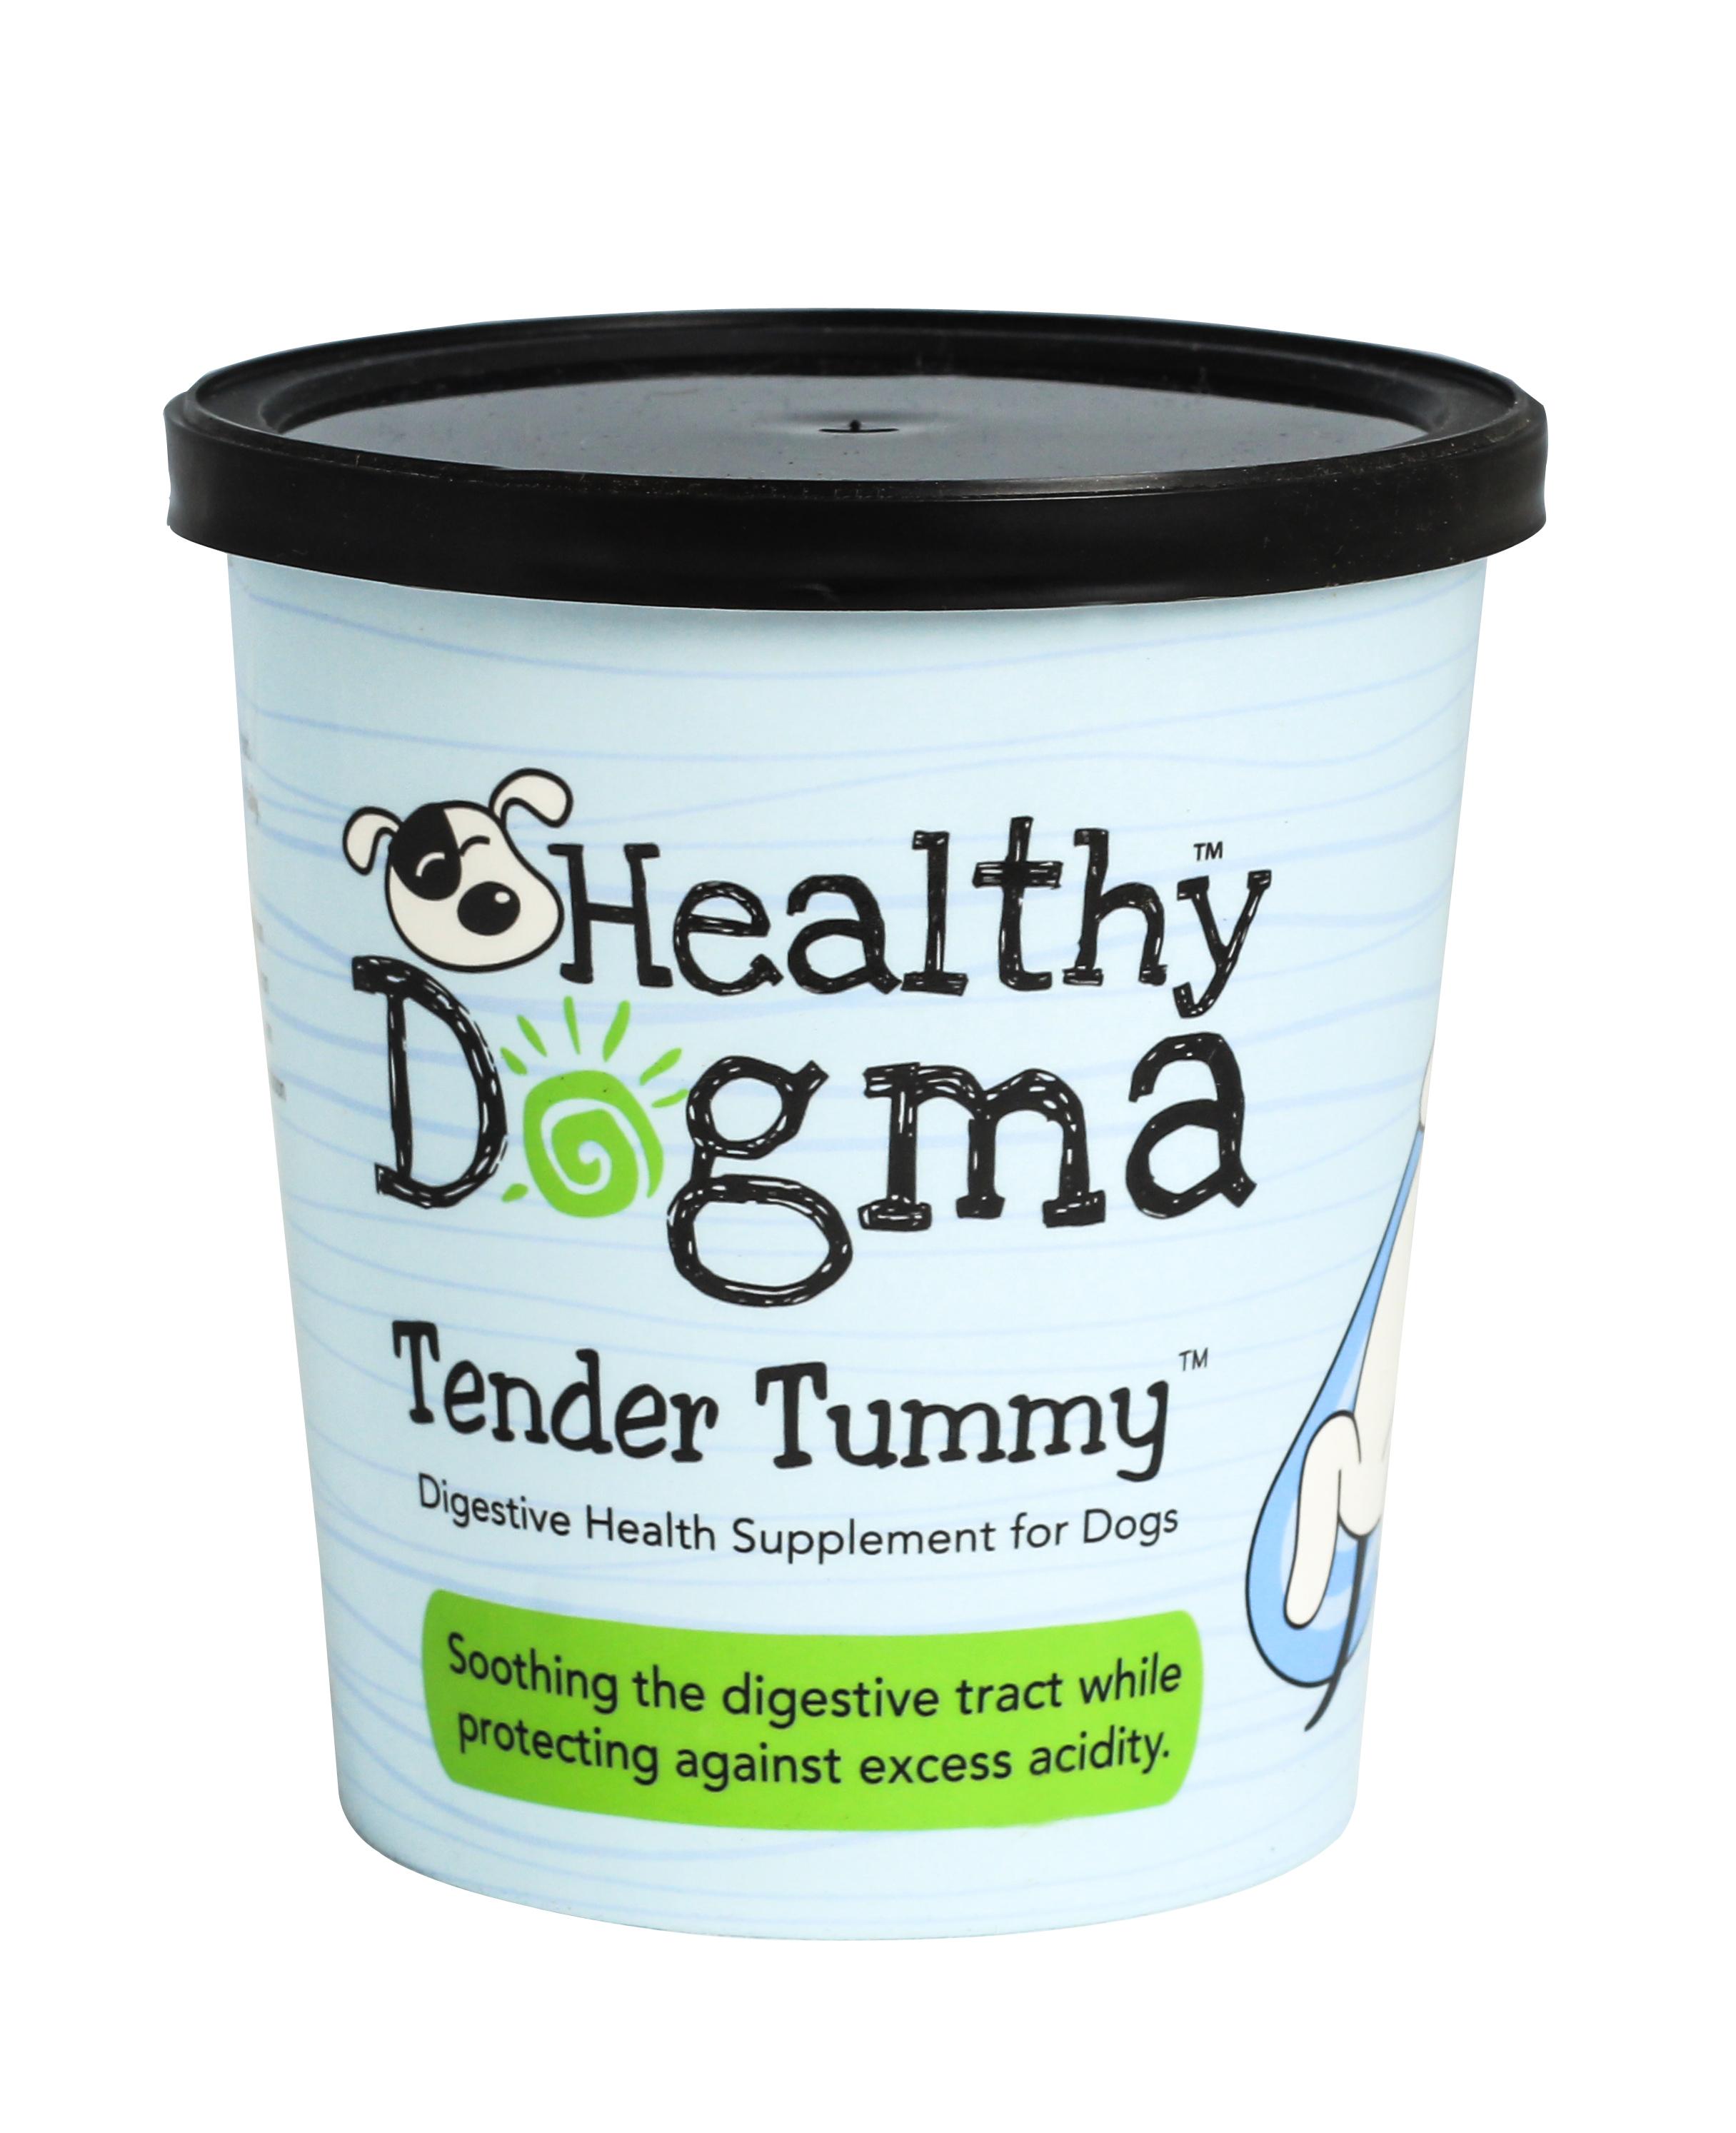 Healthy Dogma Tender Tummy to Stop Dog Diarrhea